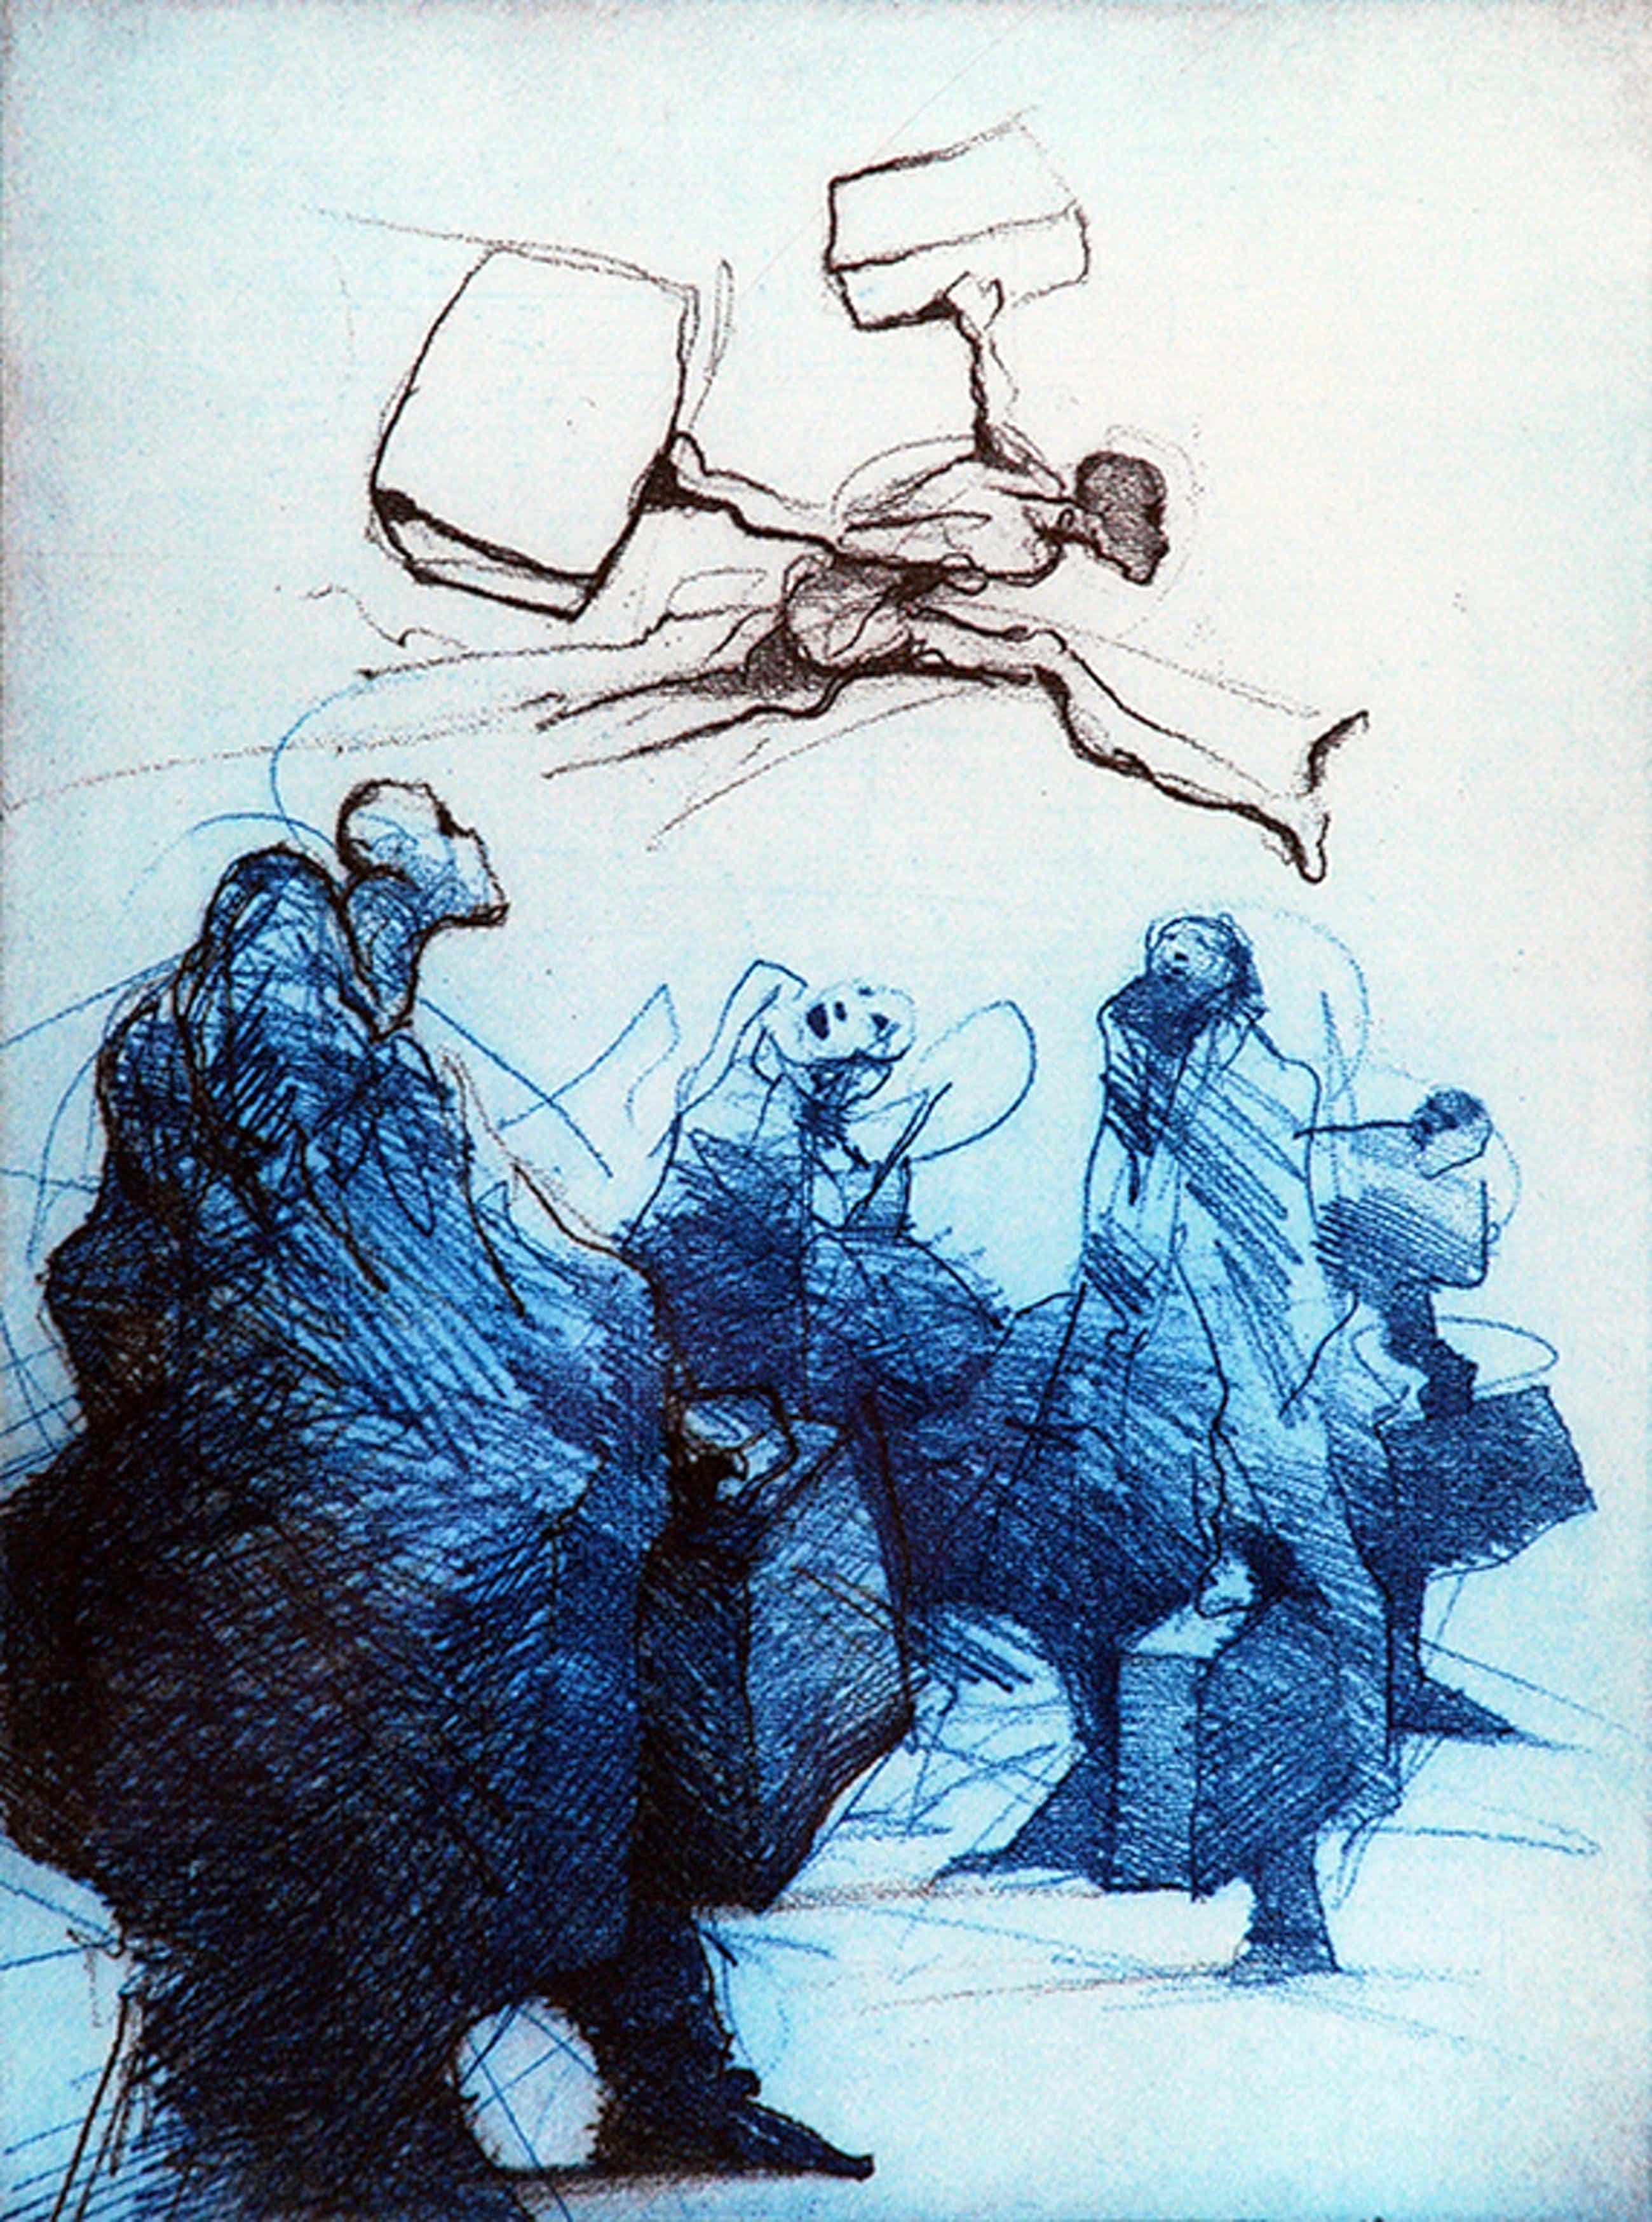 Ronald Tolman - Ronald Tolman: L'homme valise - kleurets, 1990 kopen? Bied vanaf 90!